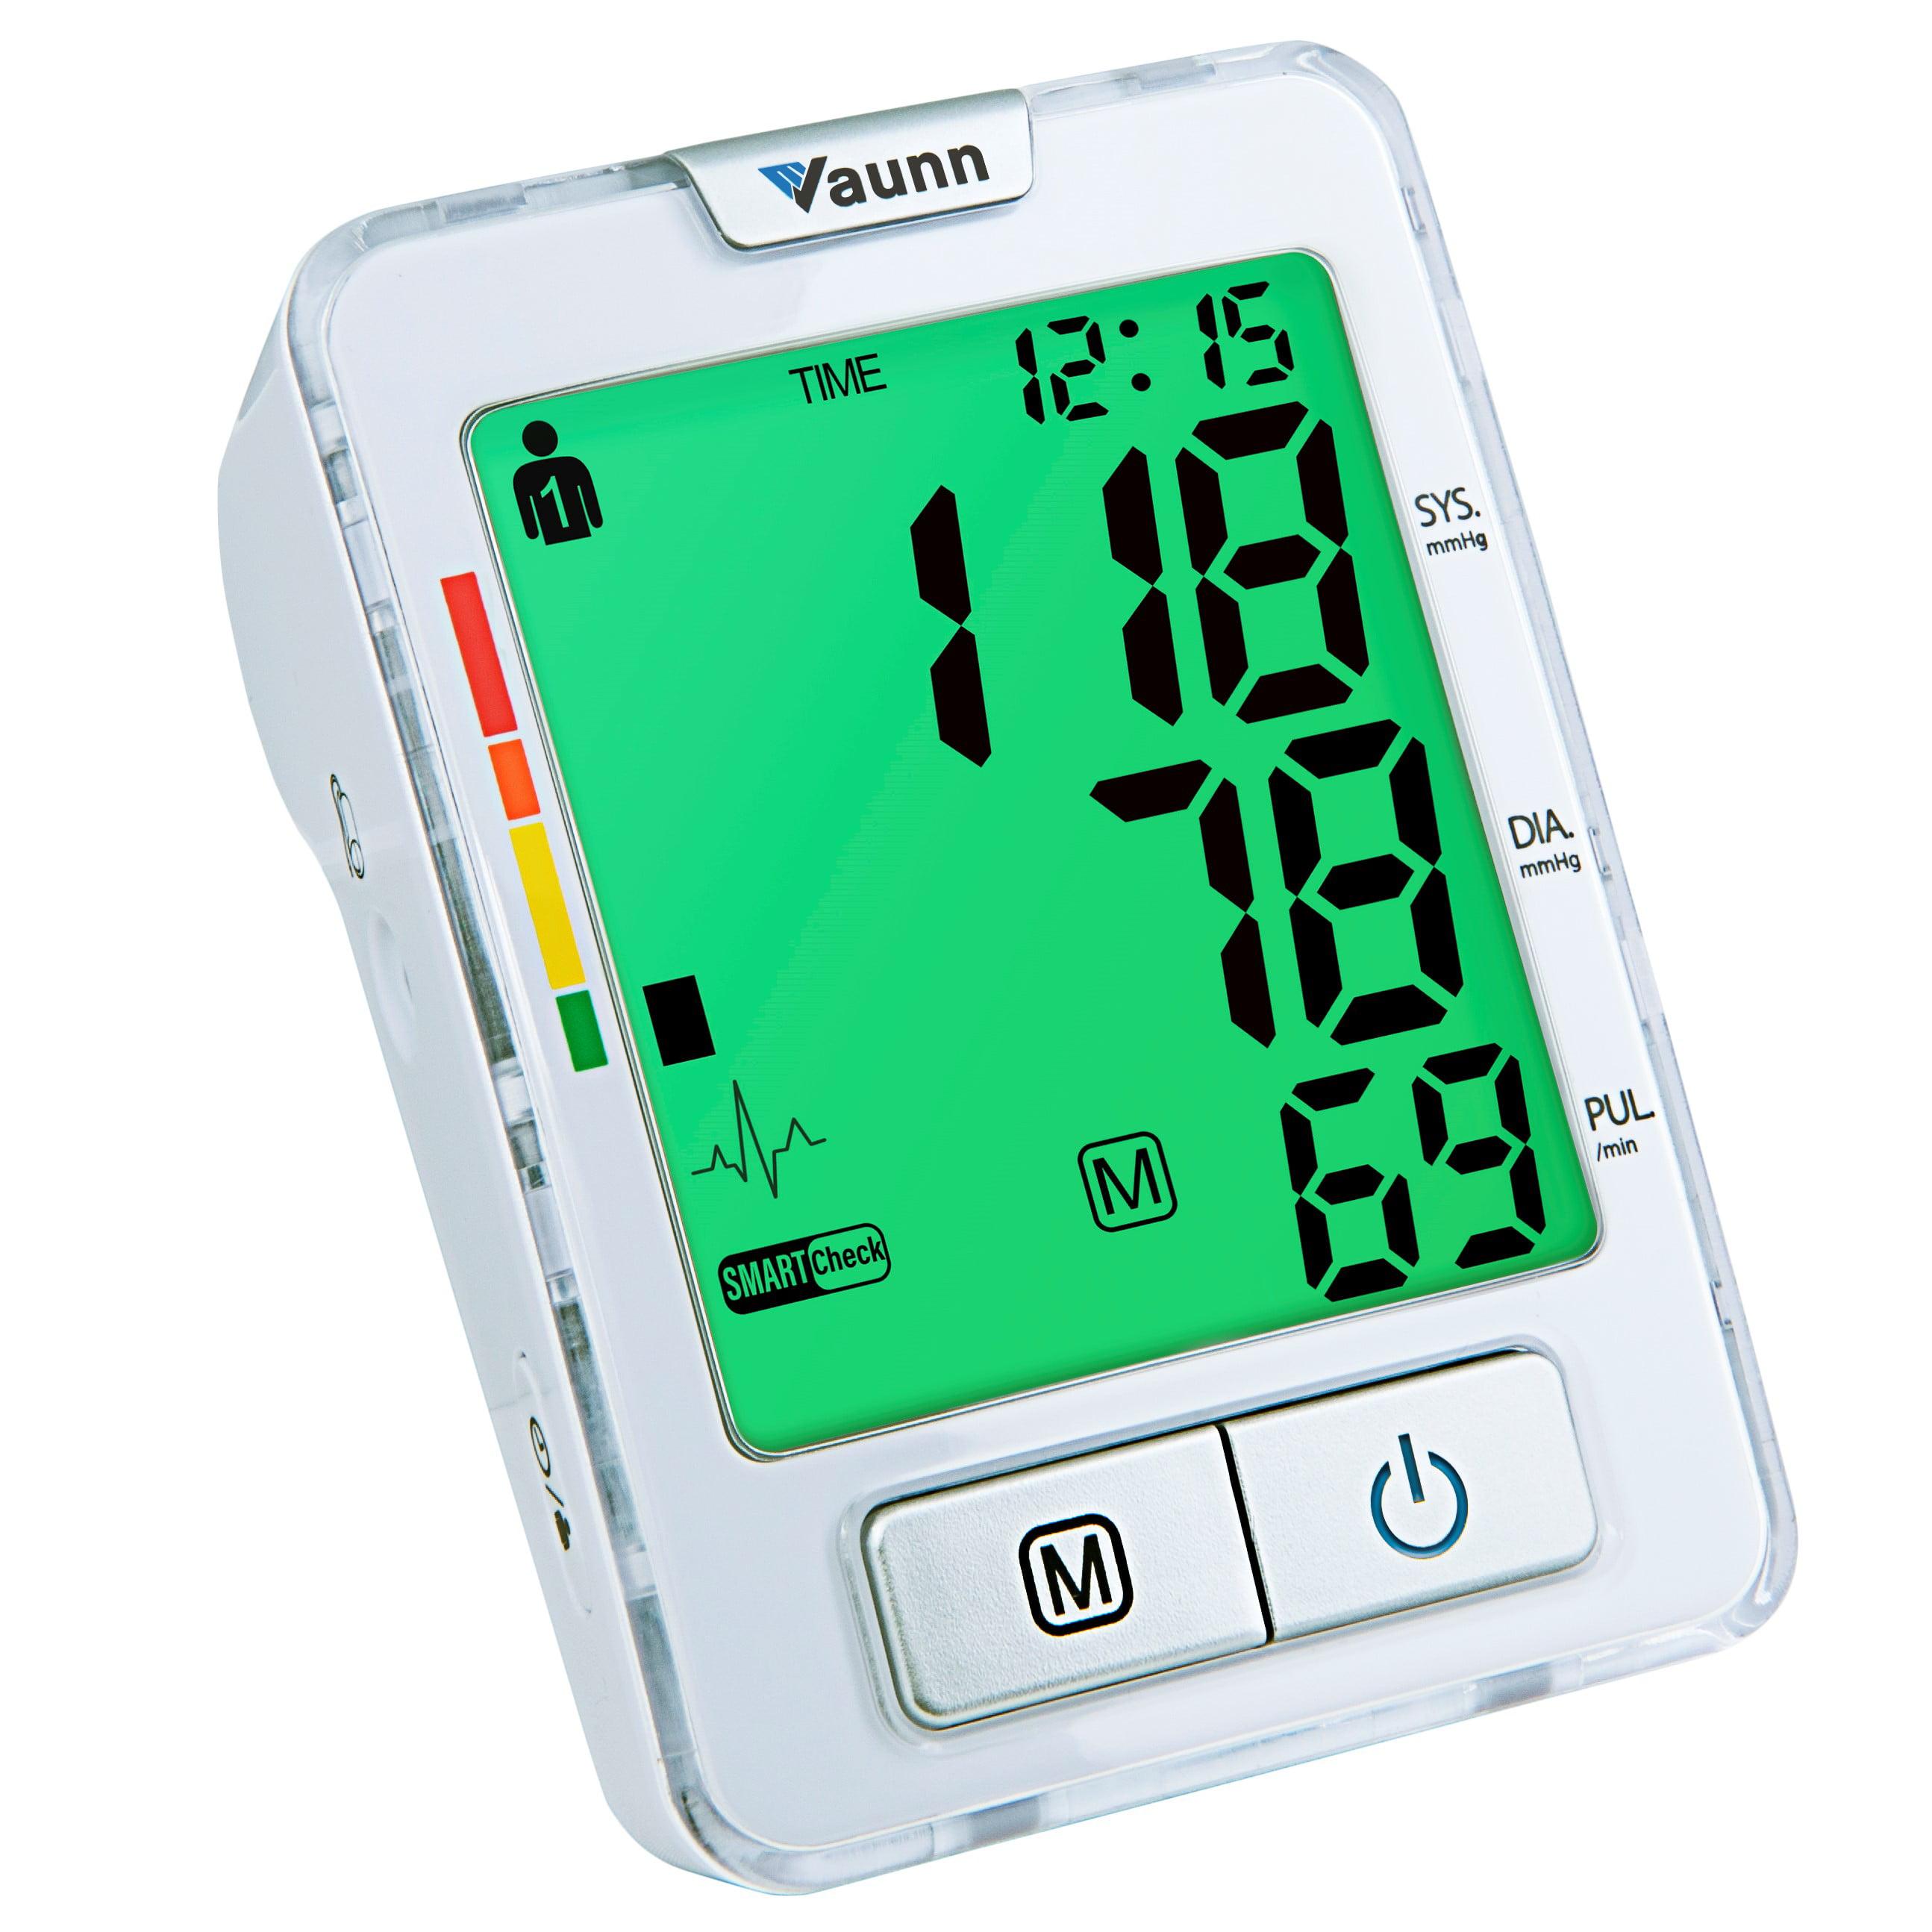 Vaunn Medical Automatic Upper Arm Blood Pressure Monitor (BPM) with Cuff